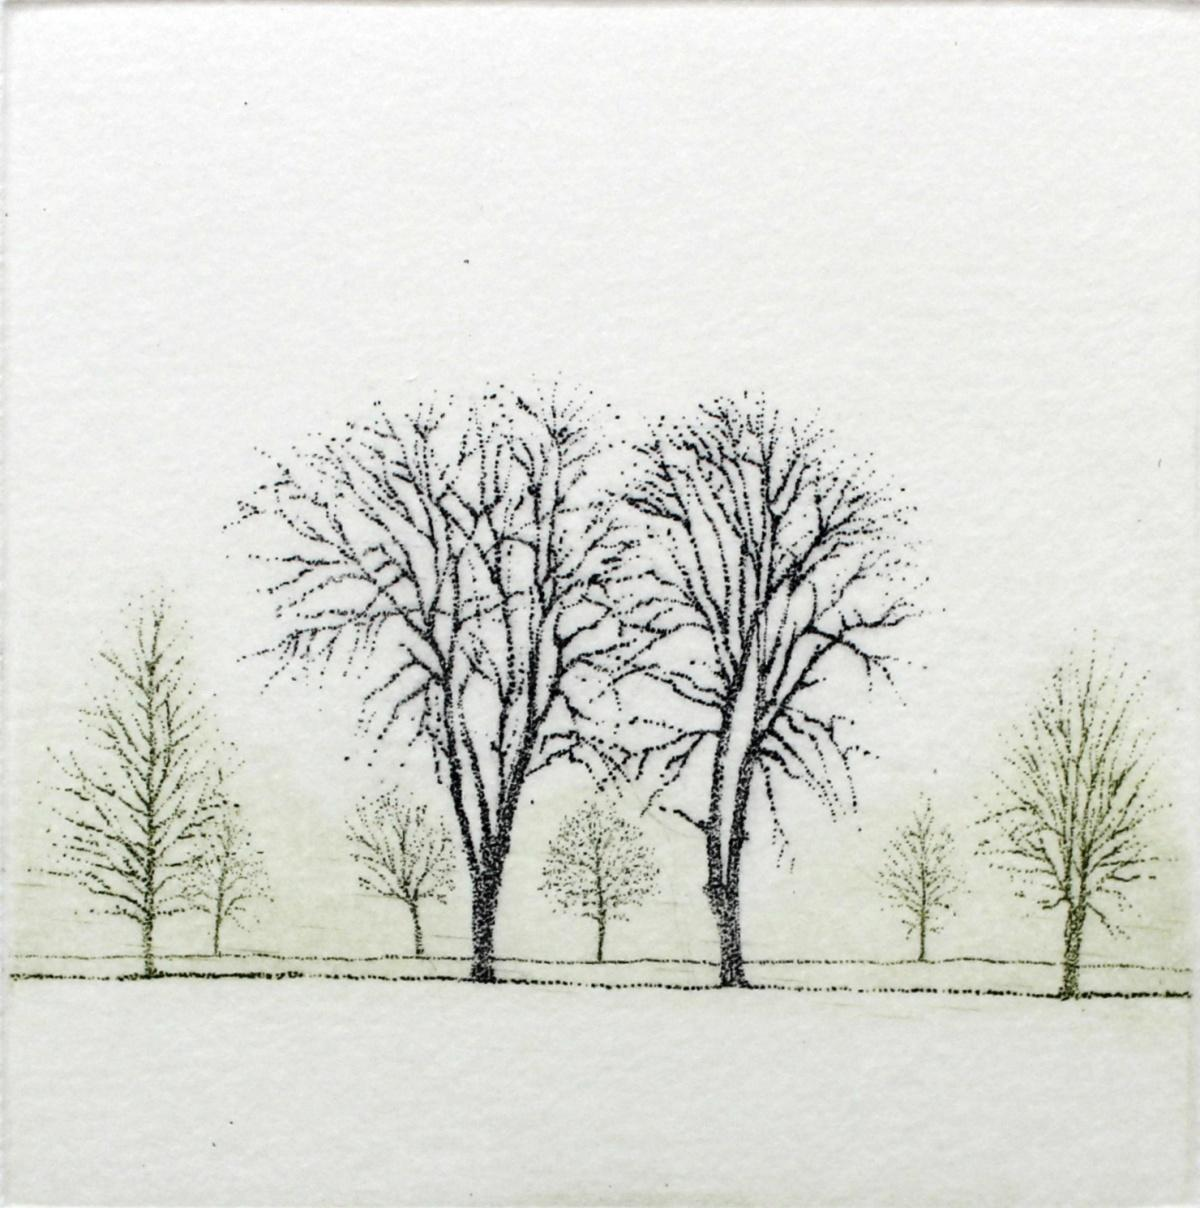 Rhythm VII - XXI century, Landscape figurative print, Colourful, White